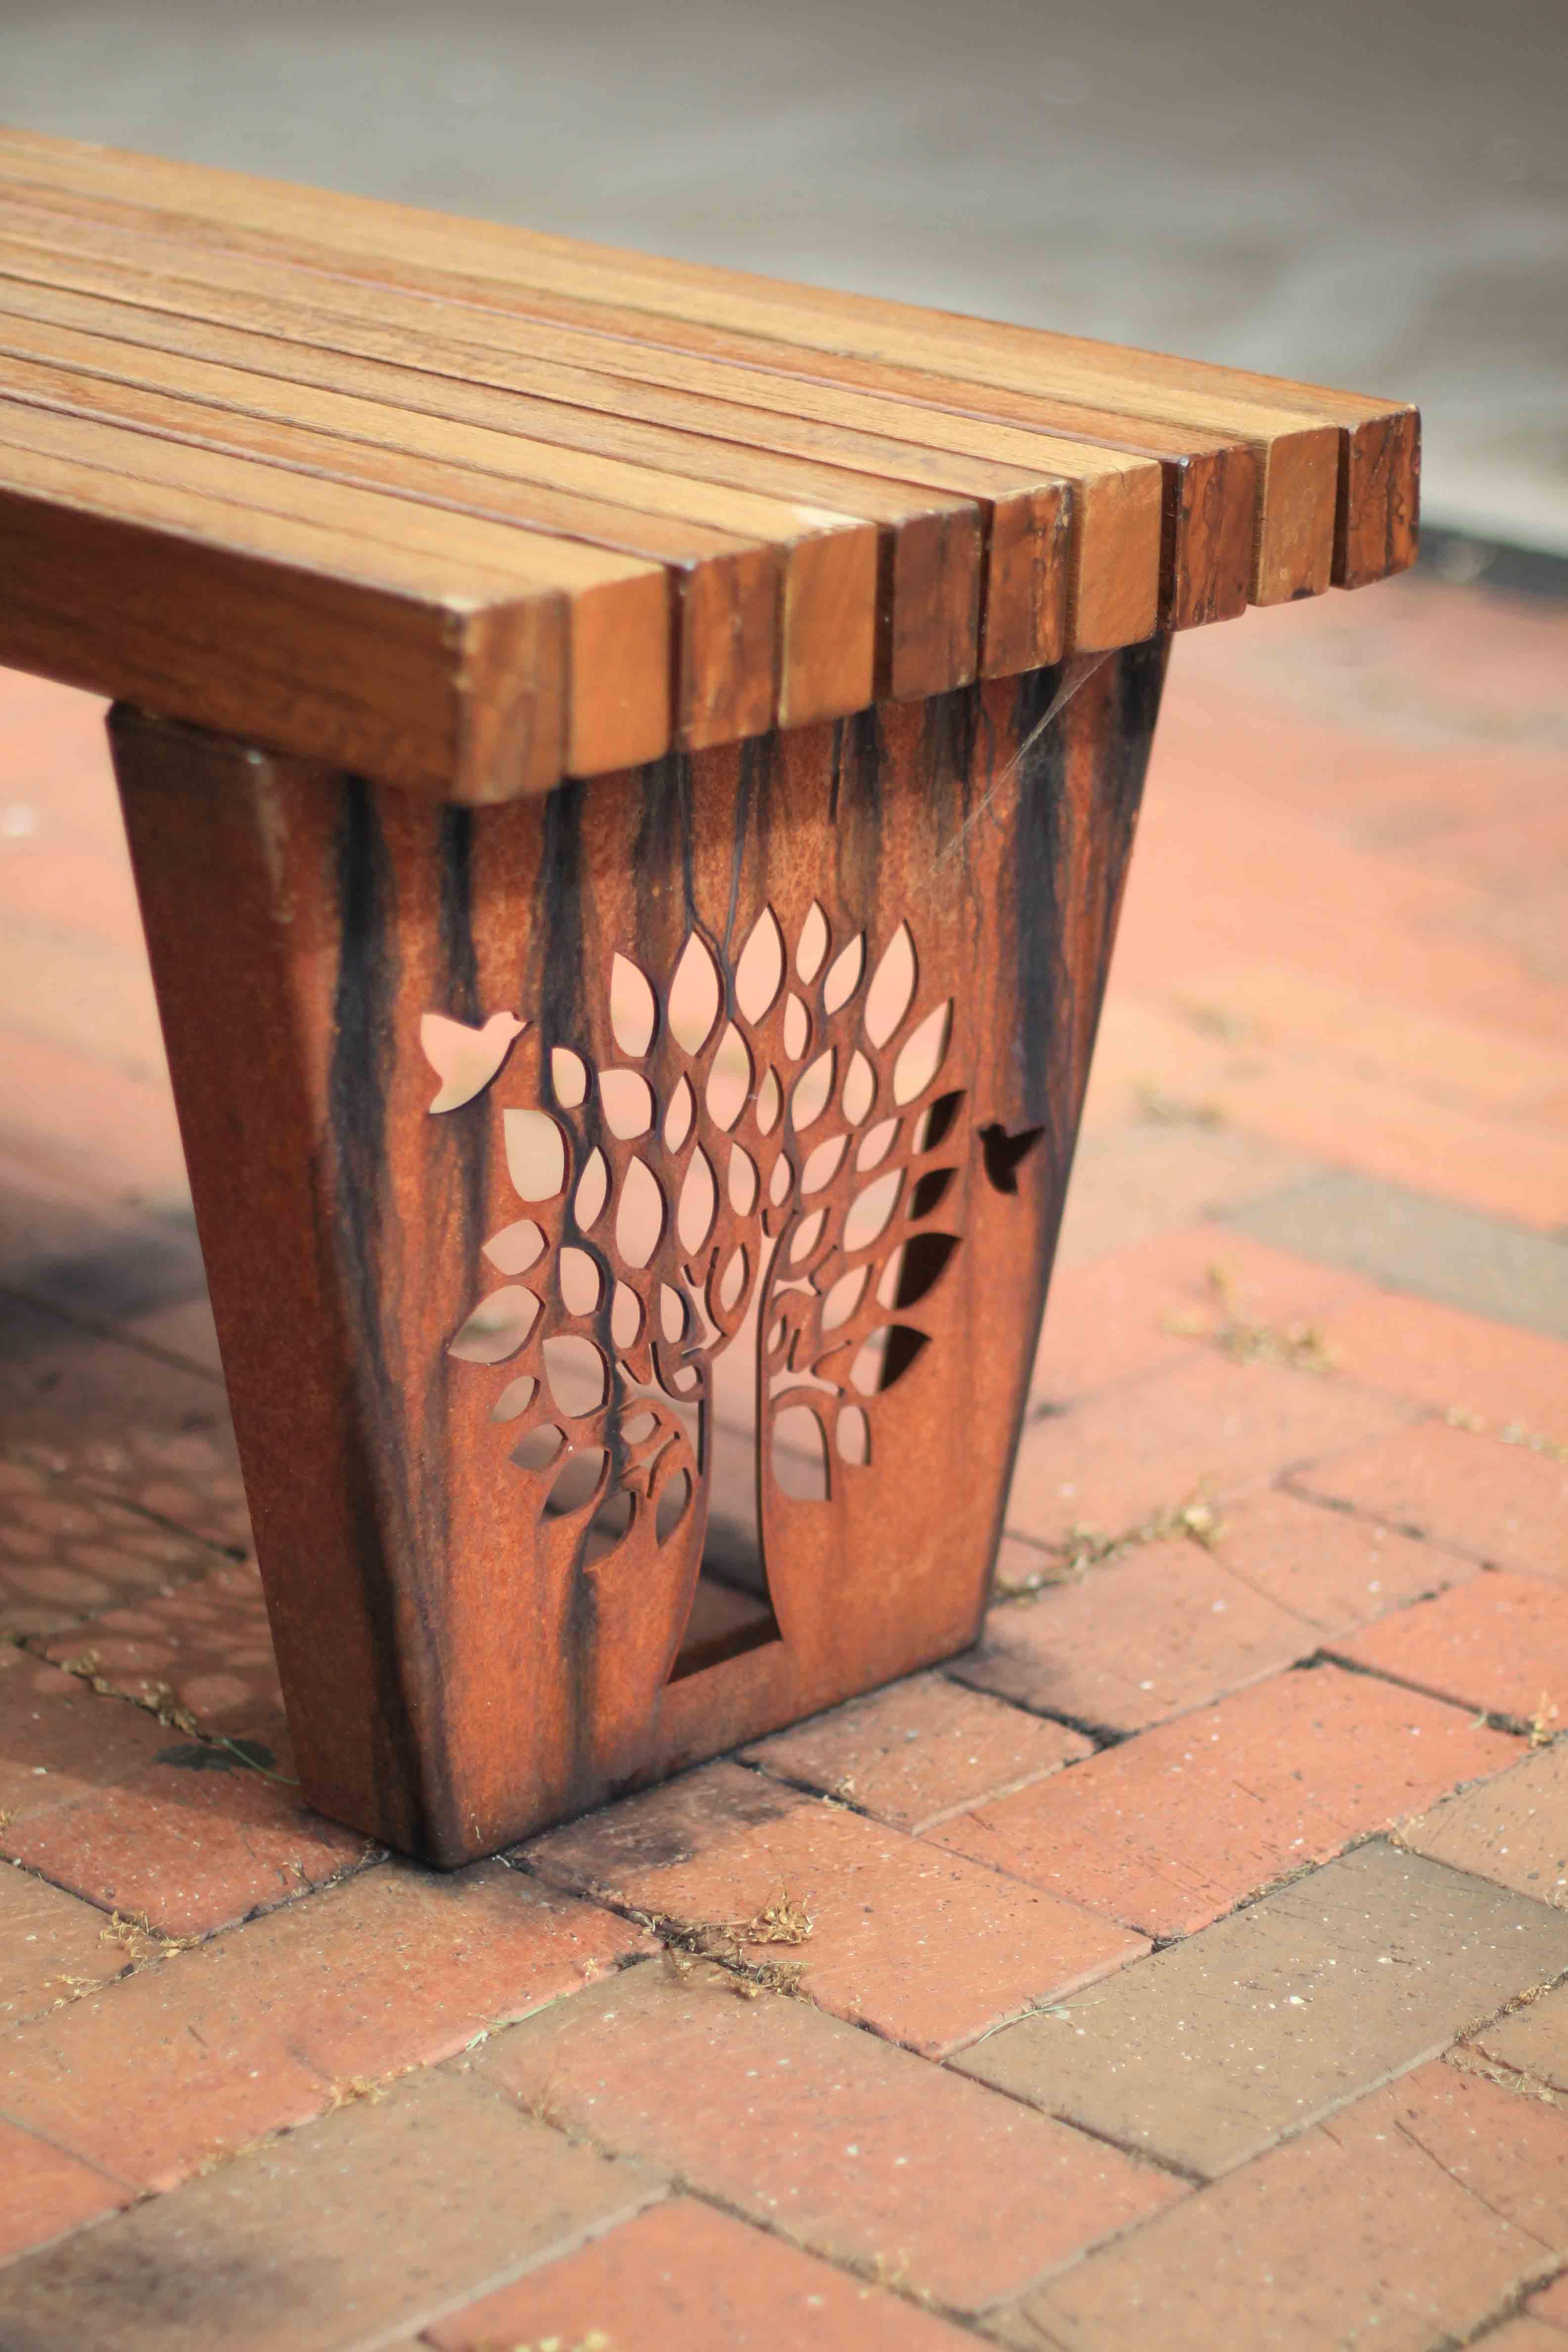 TM4550 (Rustic Corten frame, Australian hardwood timber)